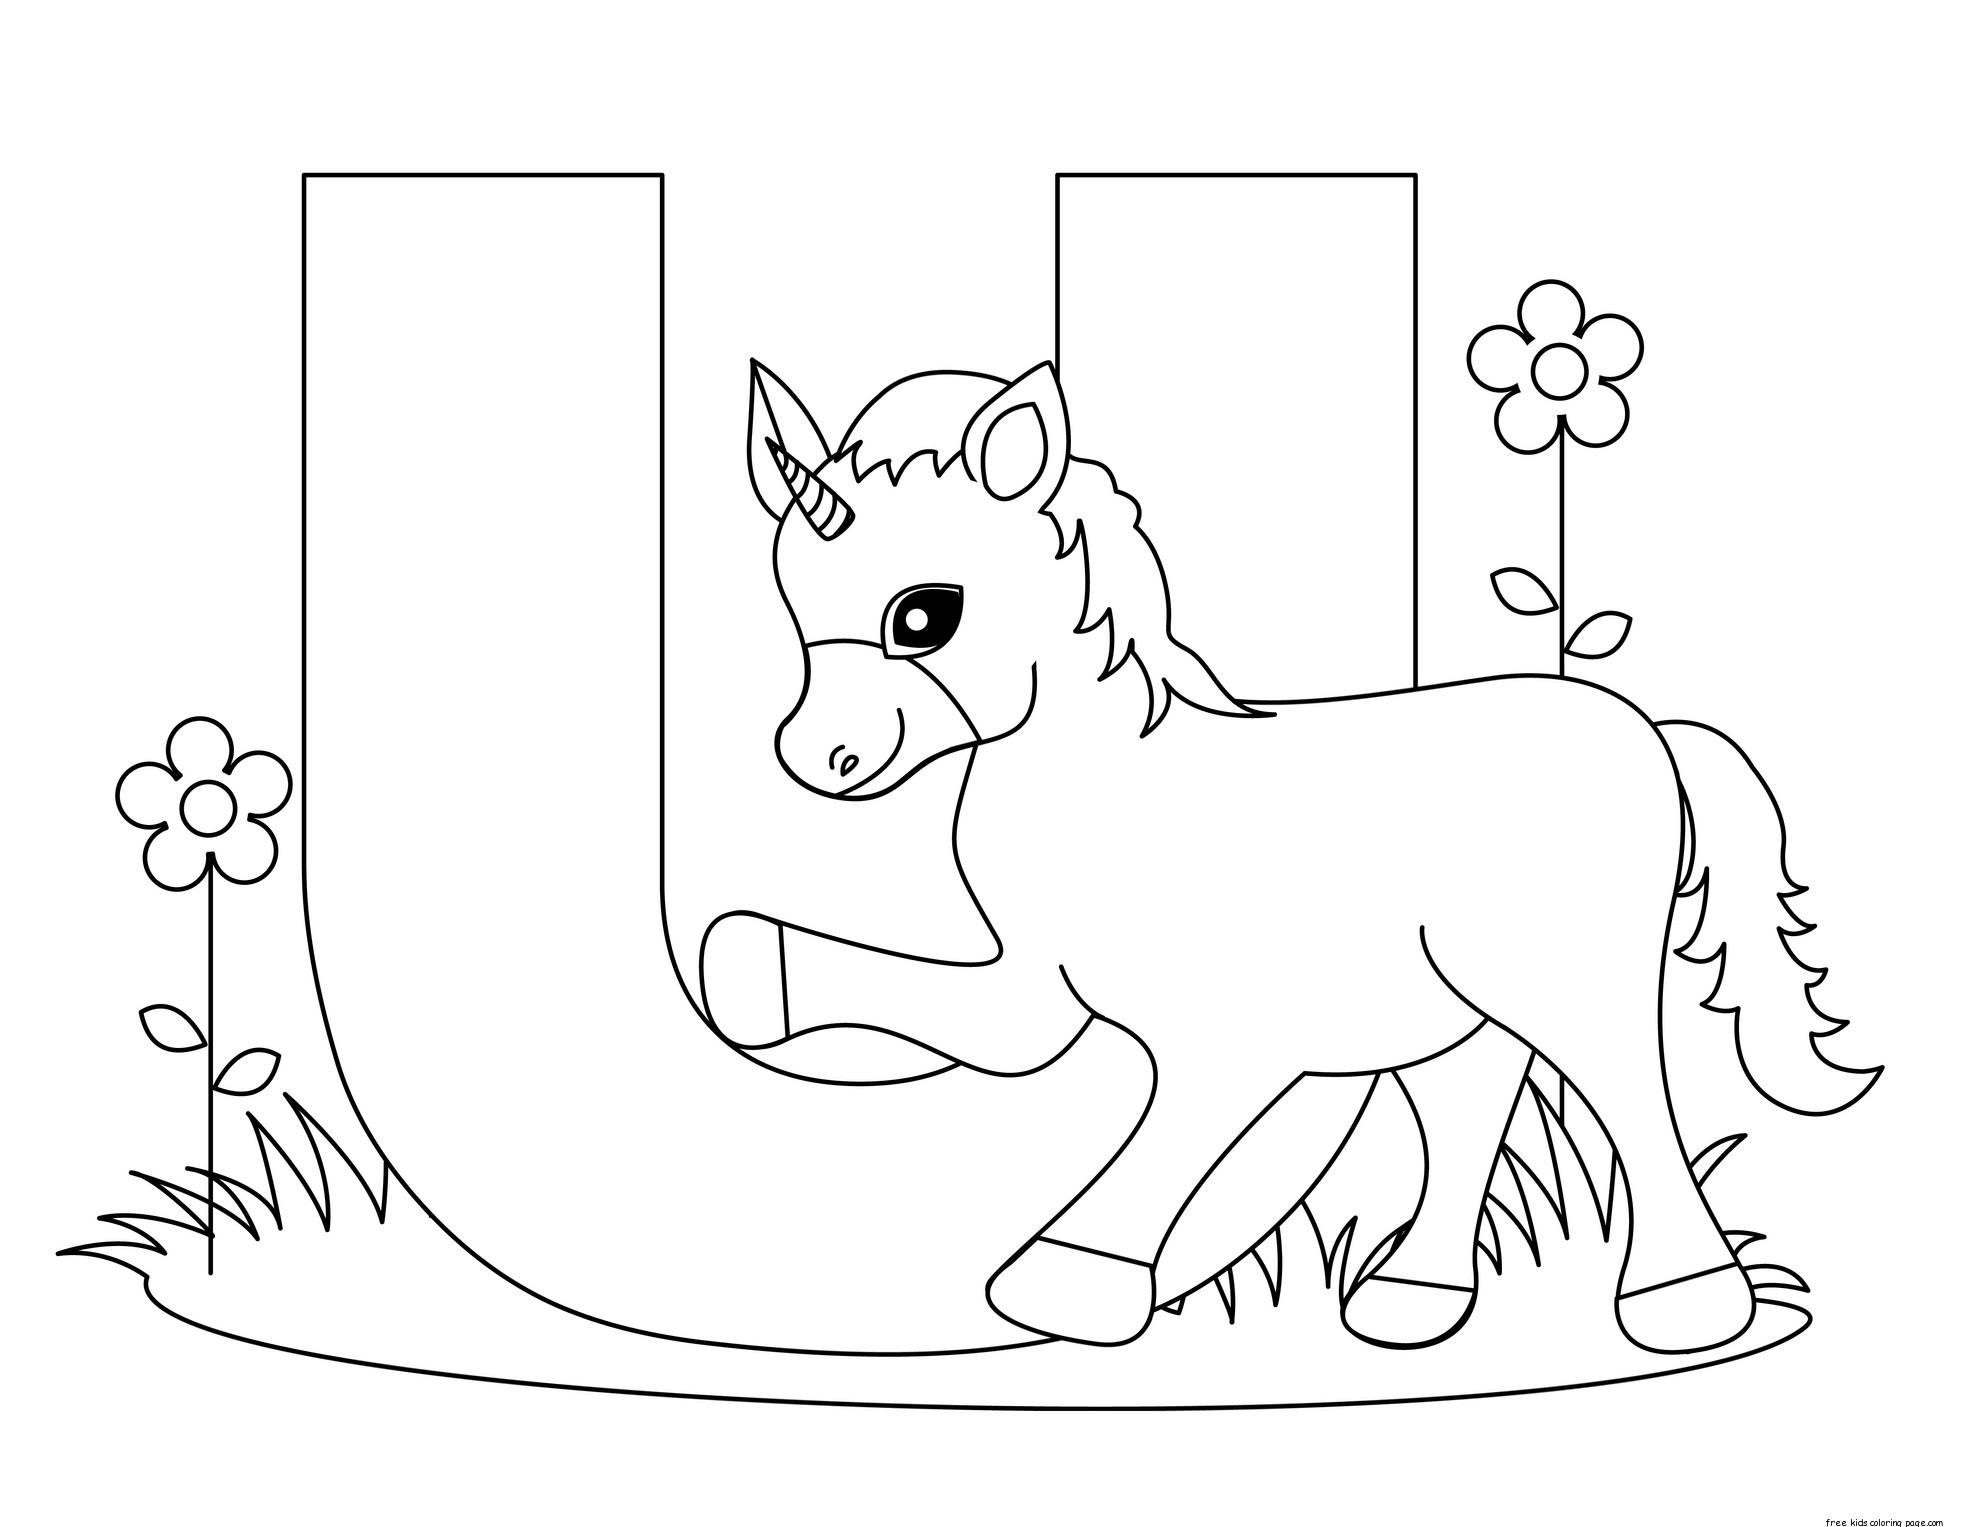 Printable Alphabet Letters Uppercase Letter U Unicorn on Superheroes Worksheets For Kids